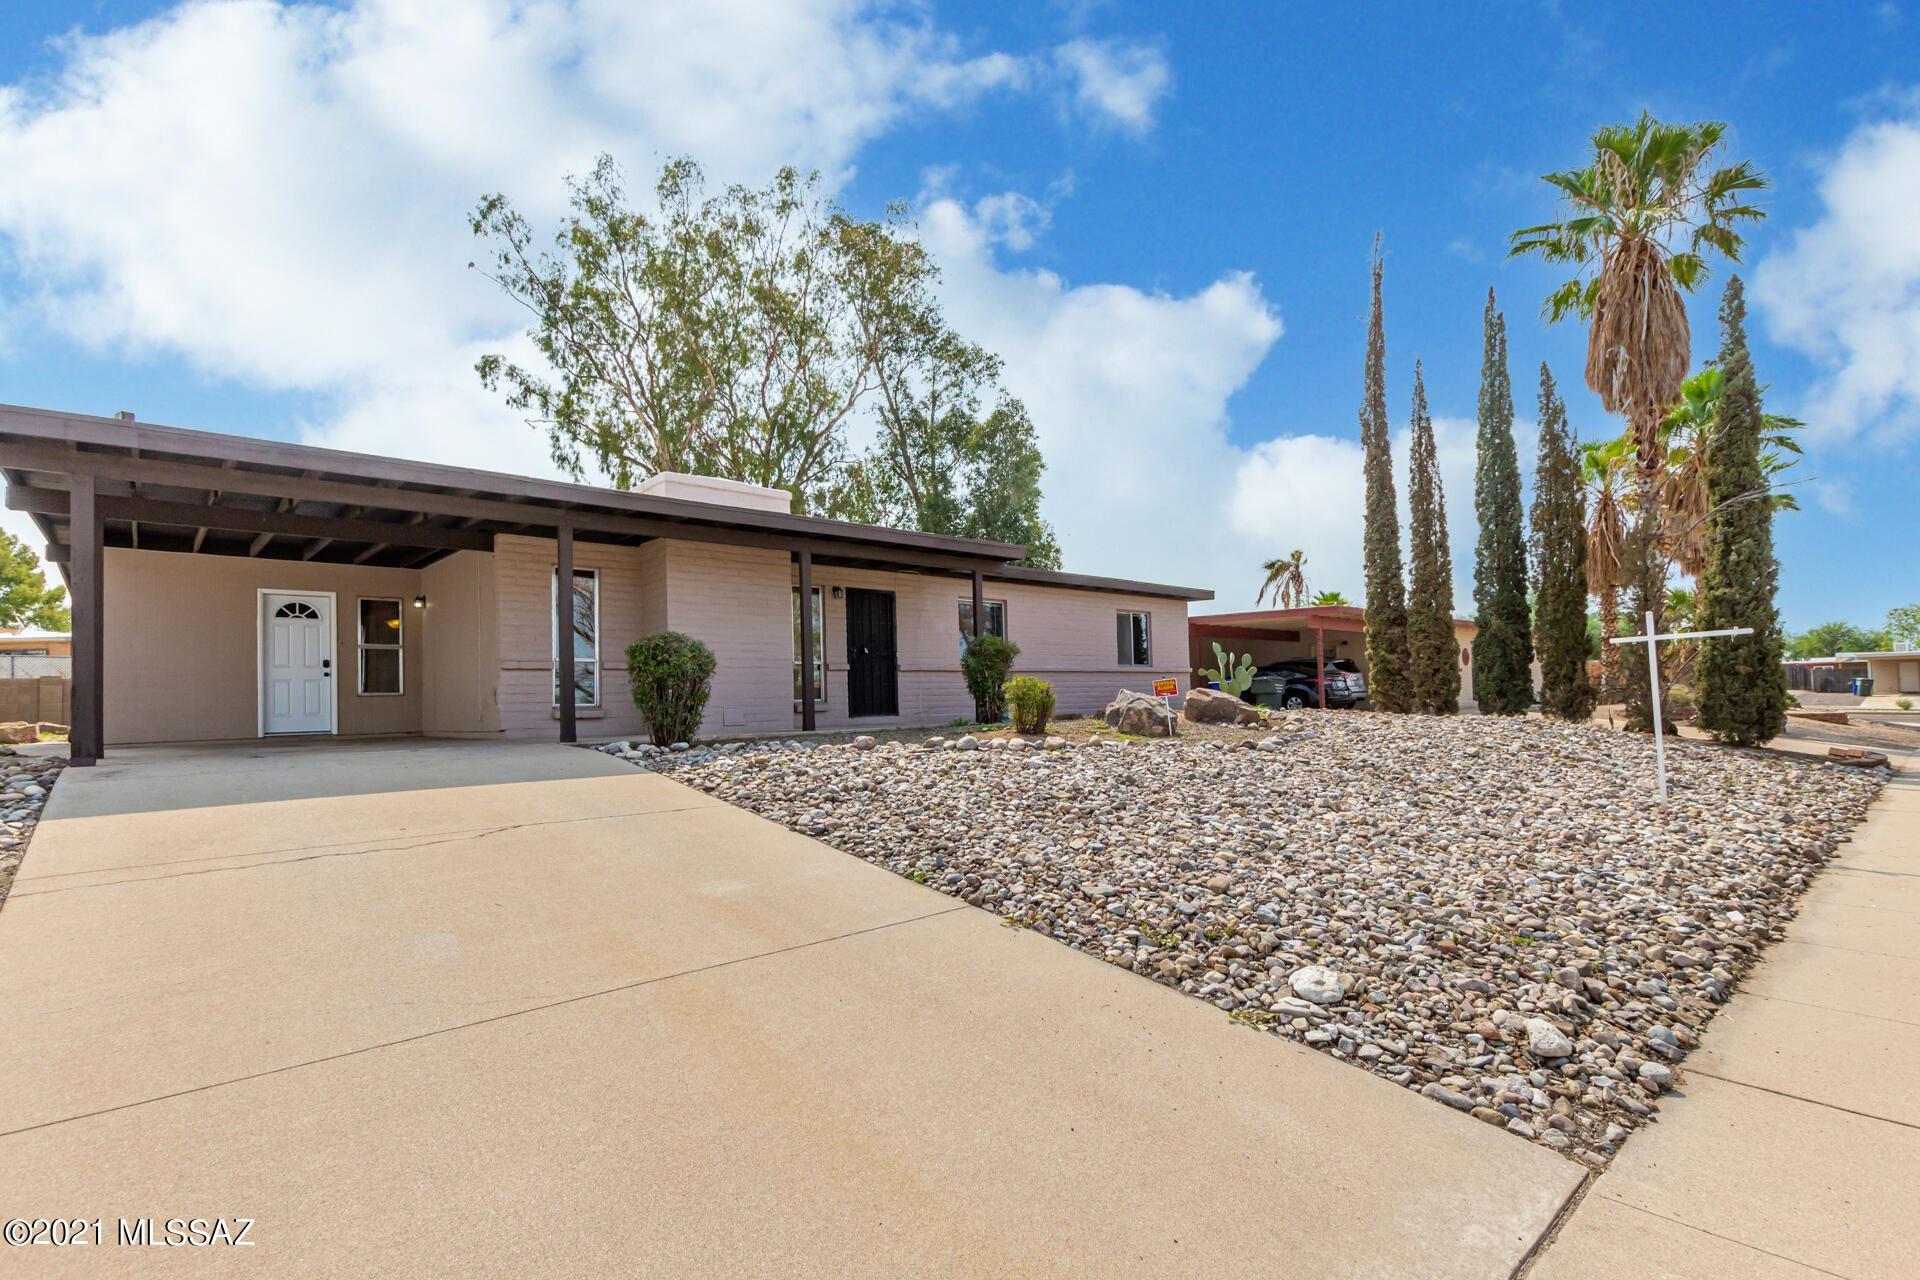 9535 E Stella Road, Tucson, AZ 85730 - MLS#: 22118983